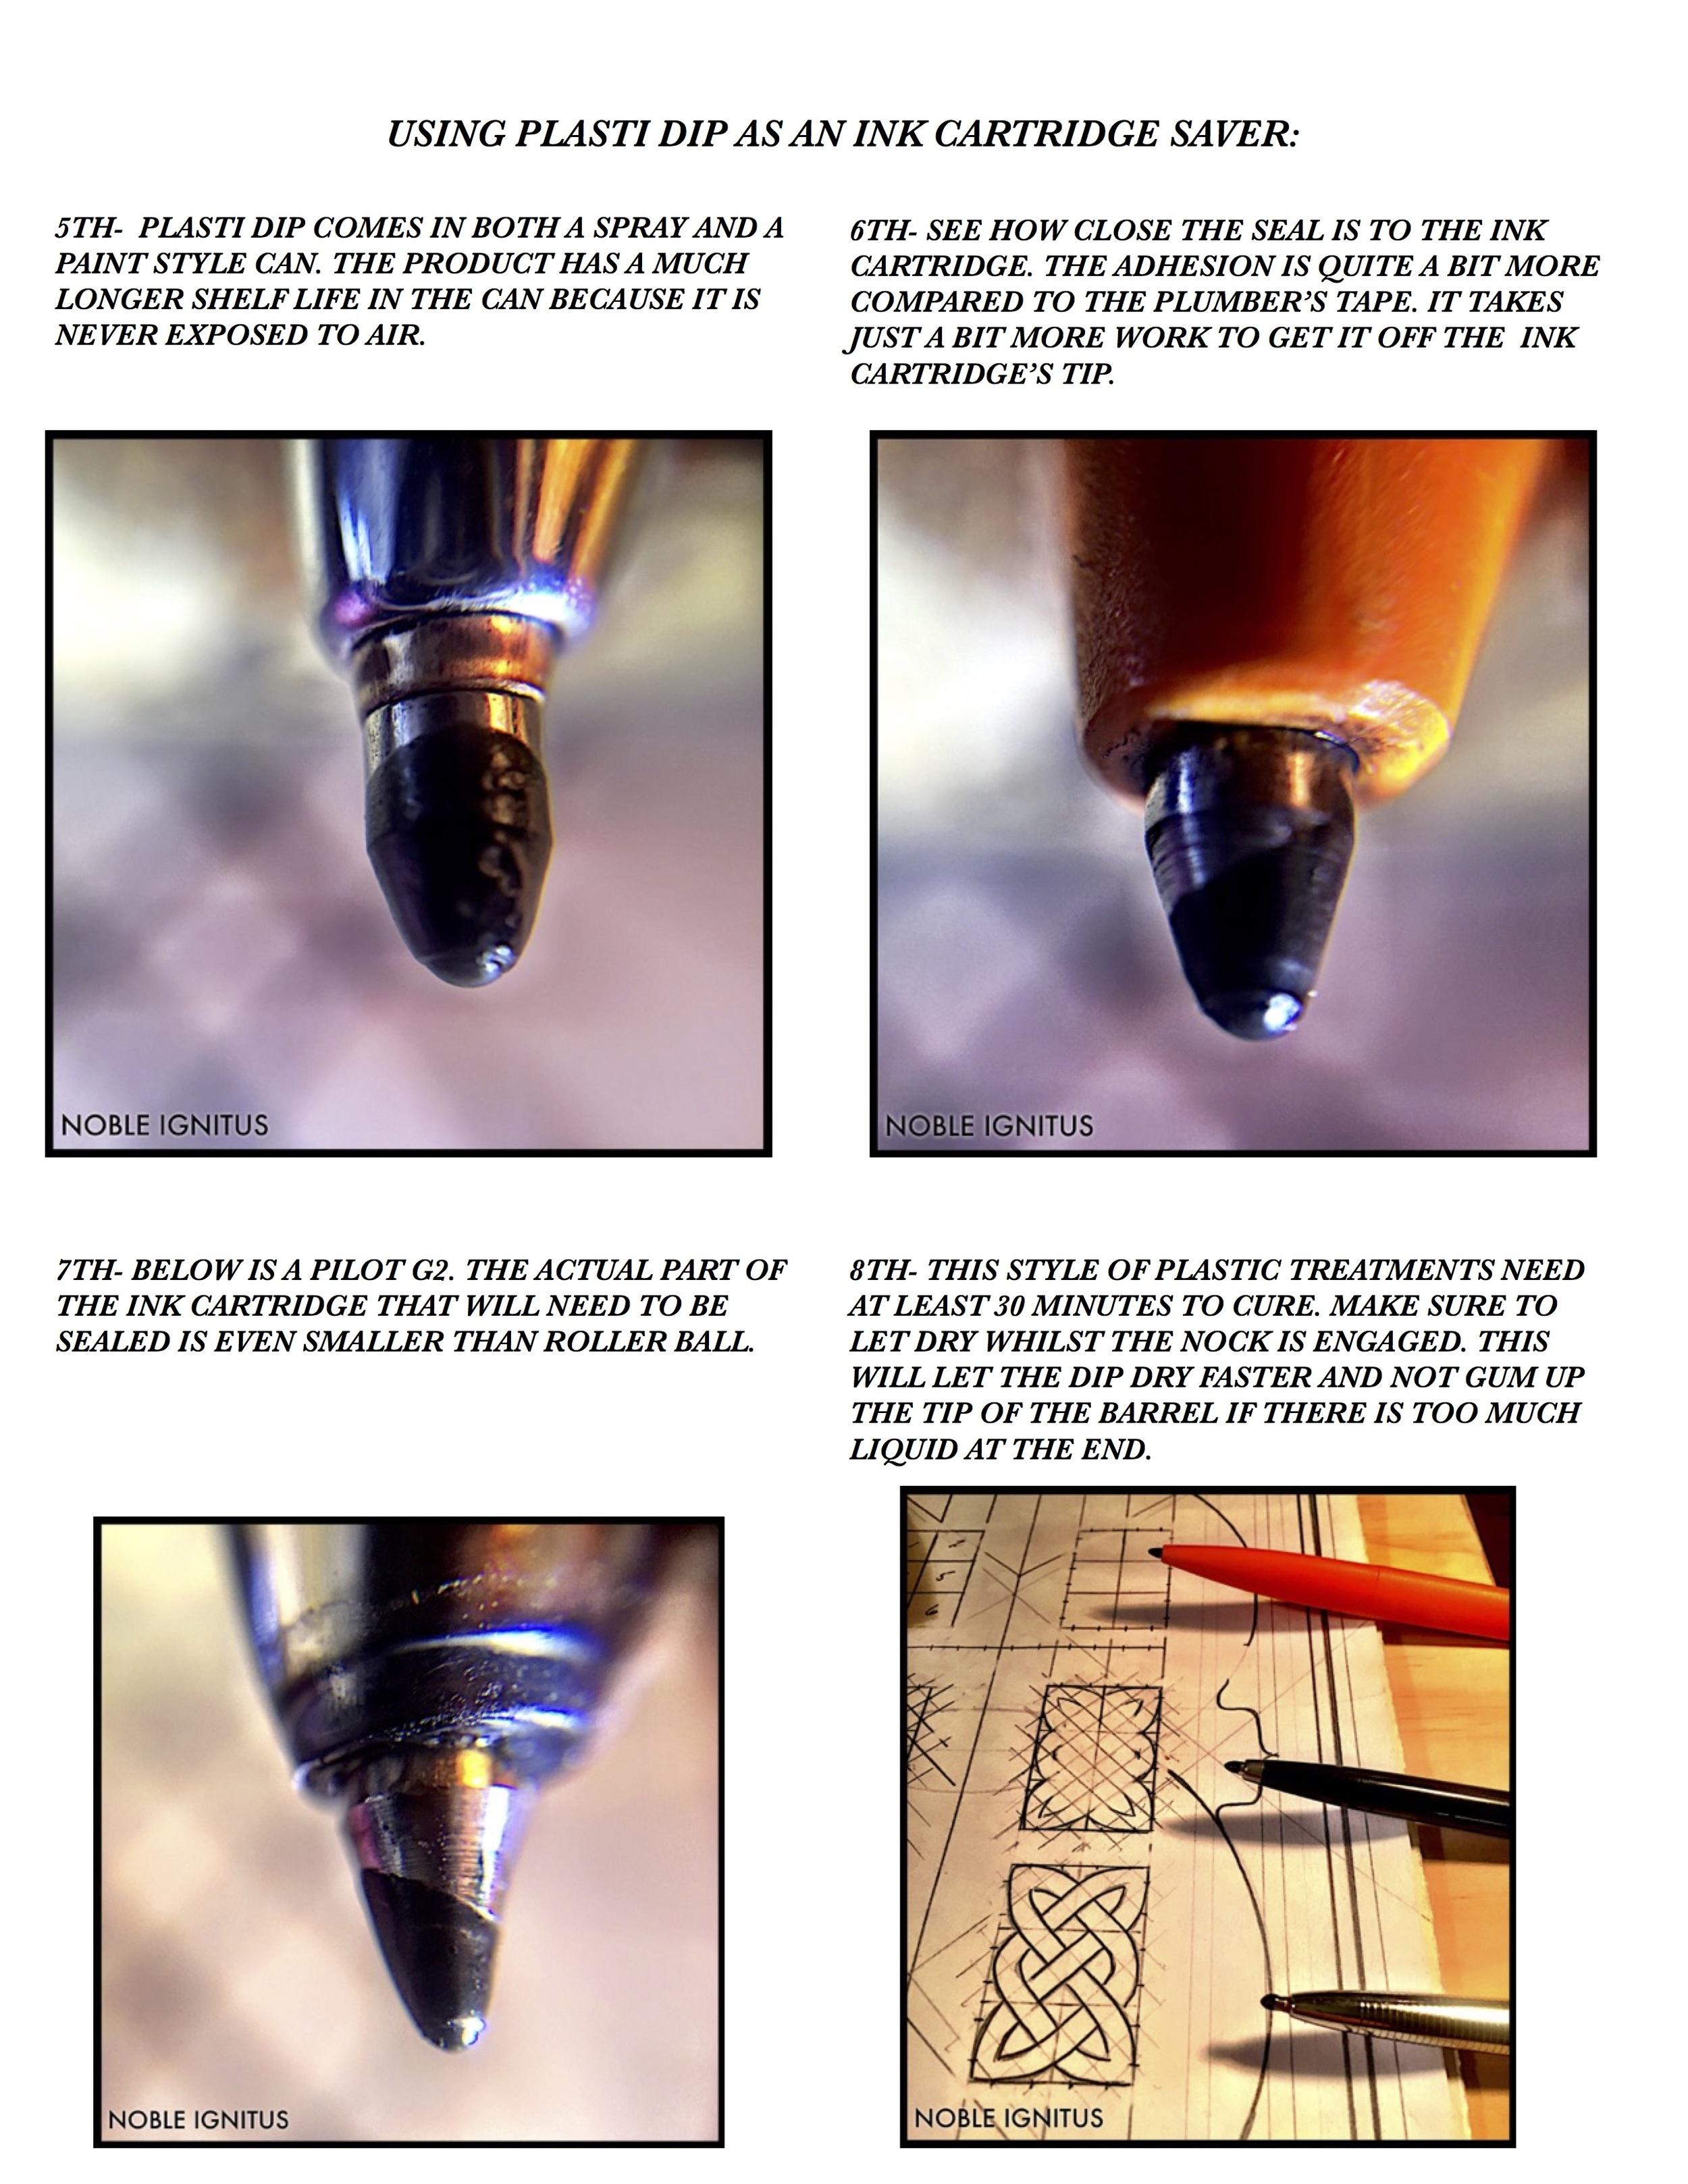 USING PLASTI DIP AS AN INK CARTRIDGE SAVER JPEG 2.jpg